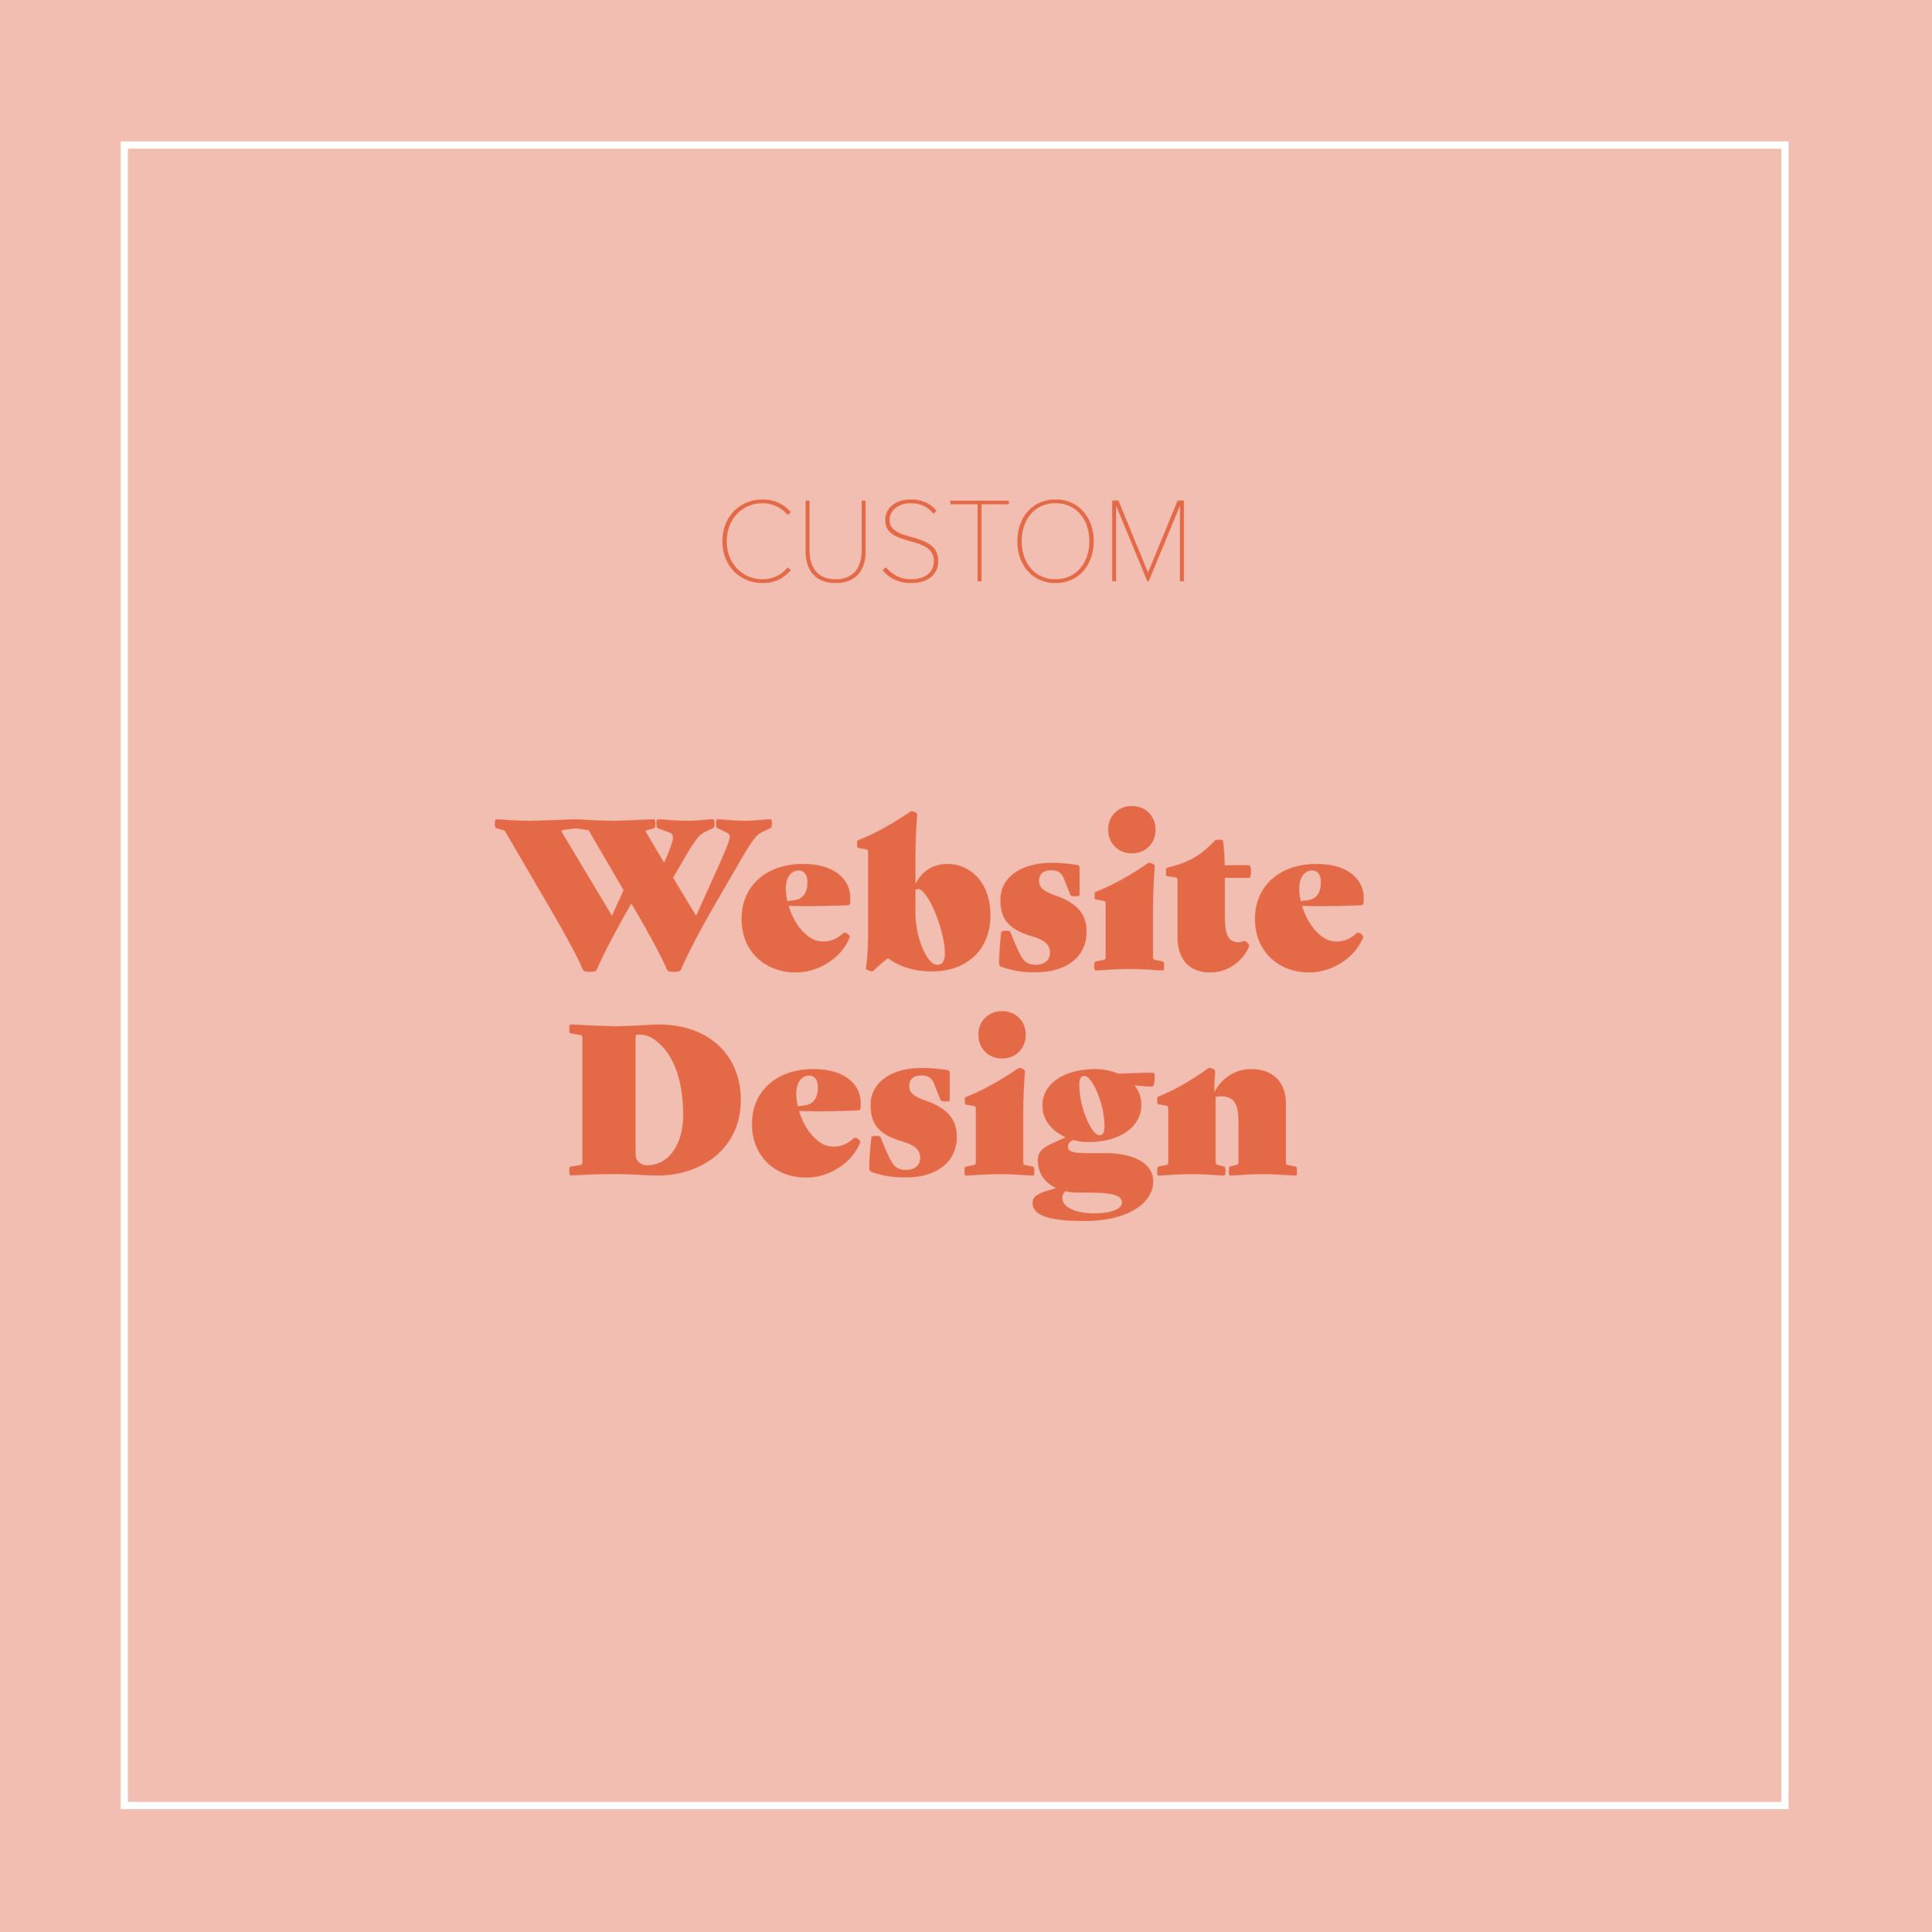 012_websitedesign_stacyaguilar.png